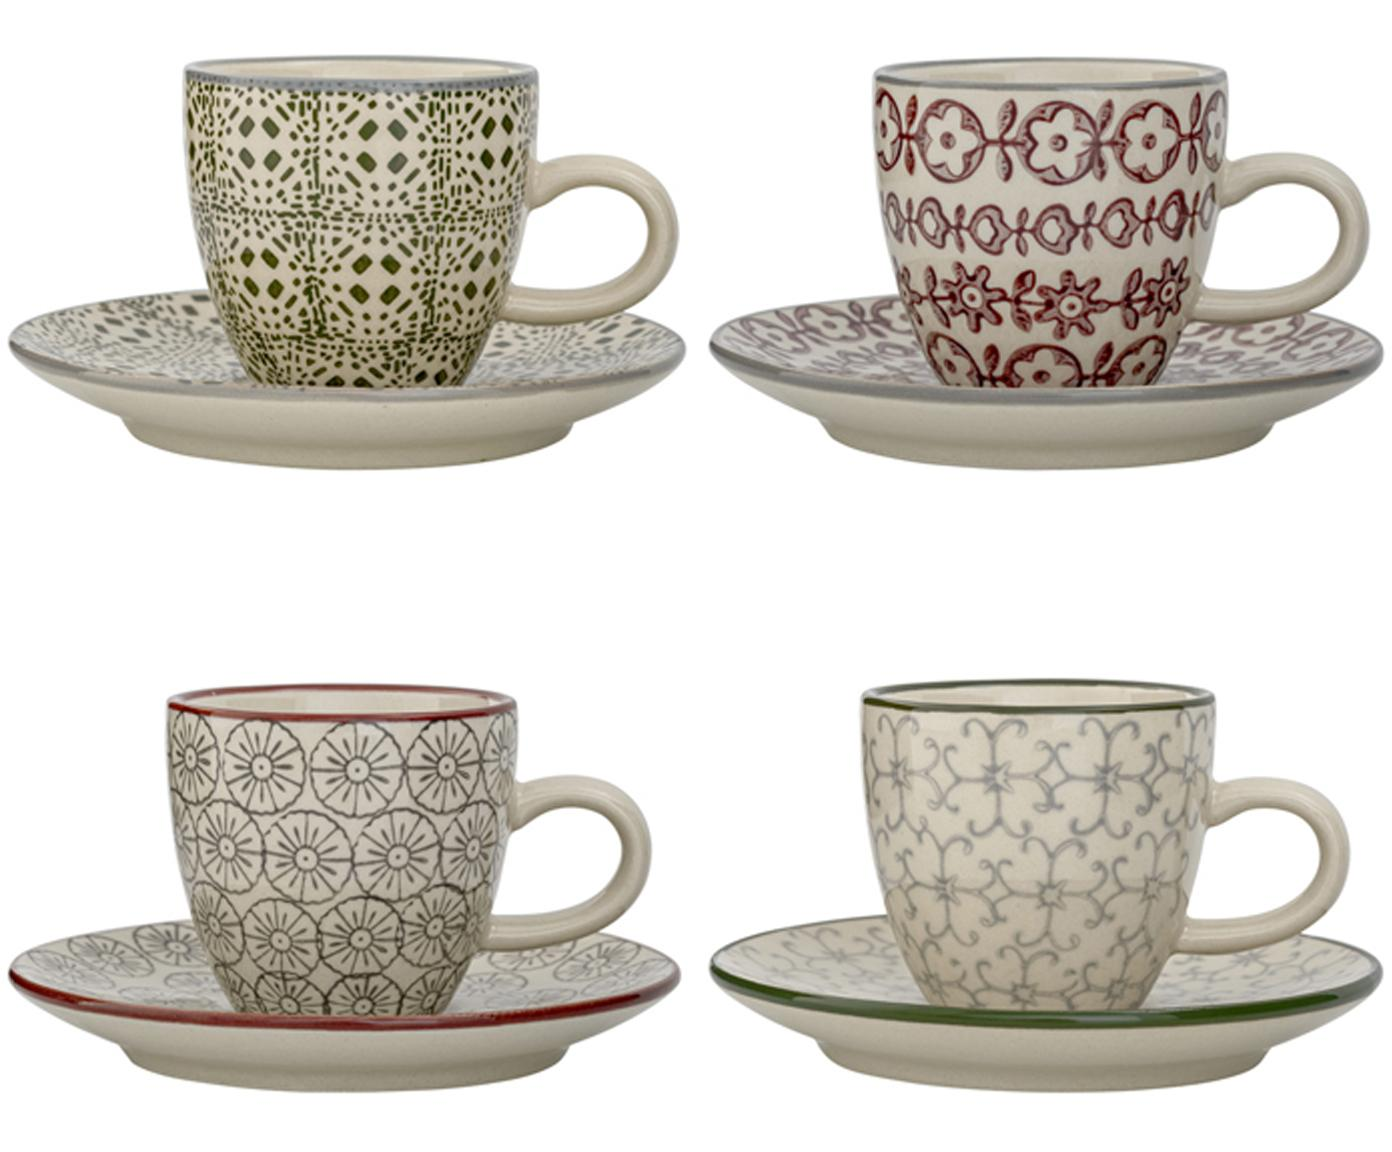 Set 8 tazze da caffè Karine, Terracotta, Bianco, verde, rosso, grigio, Ø 6 x Alt. 6 cm